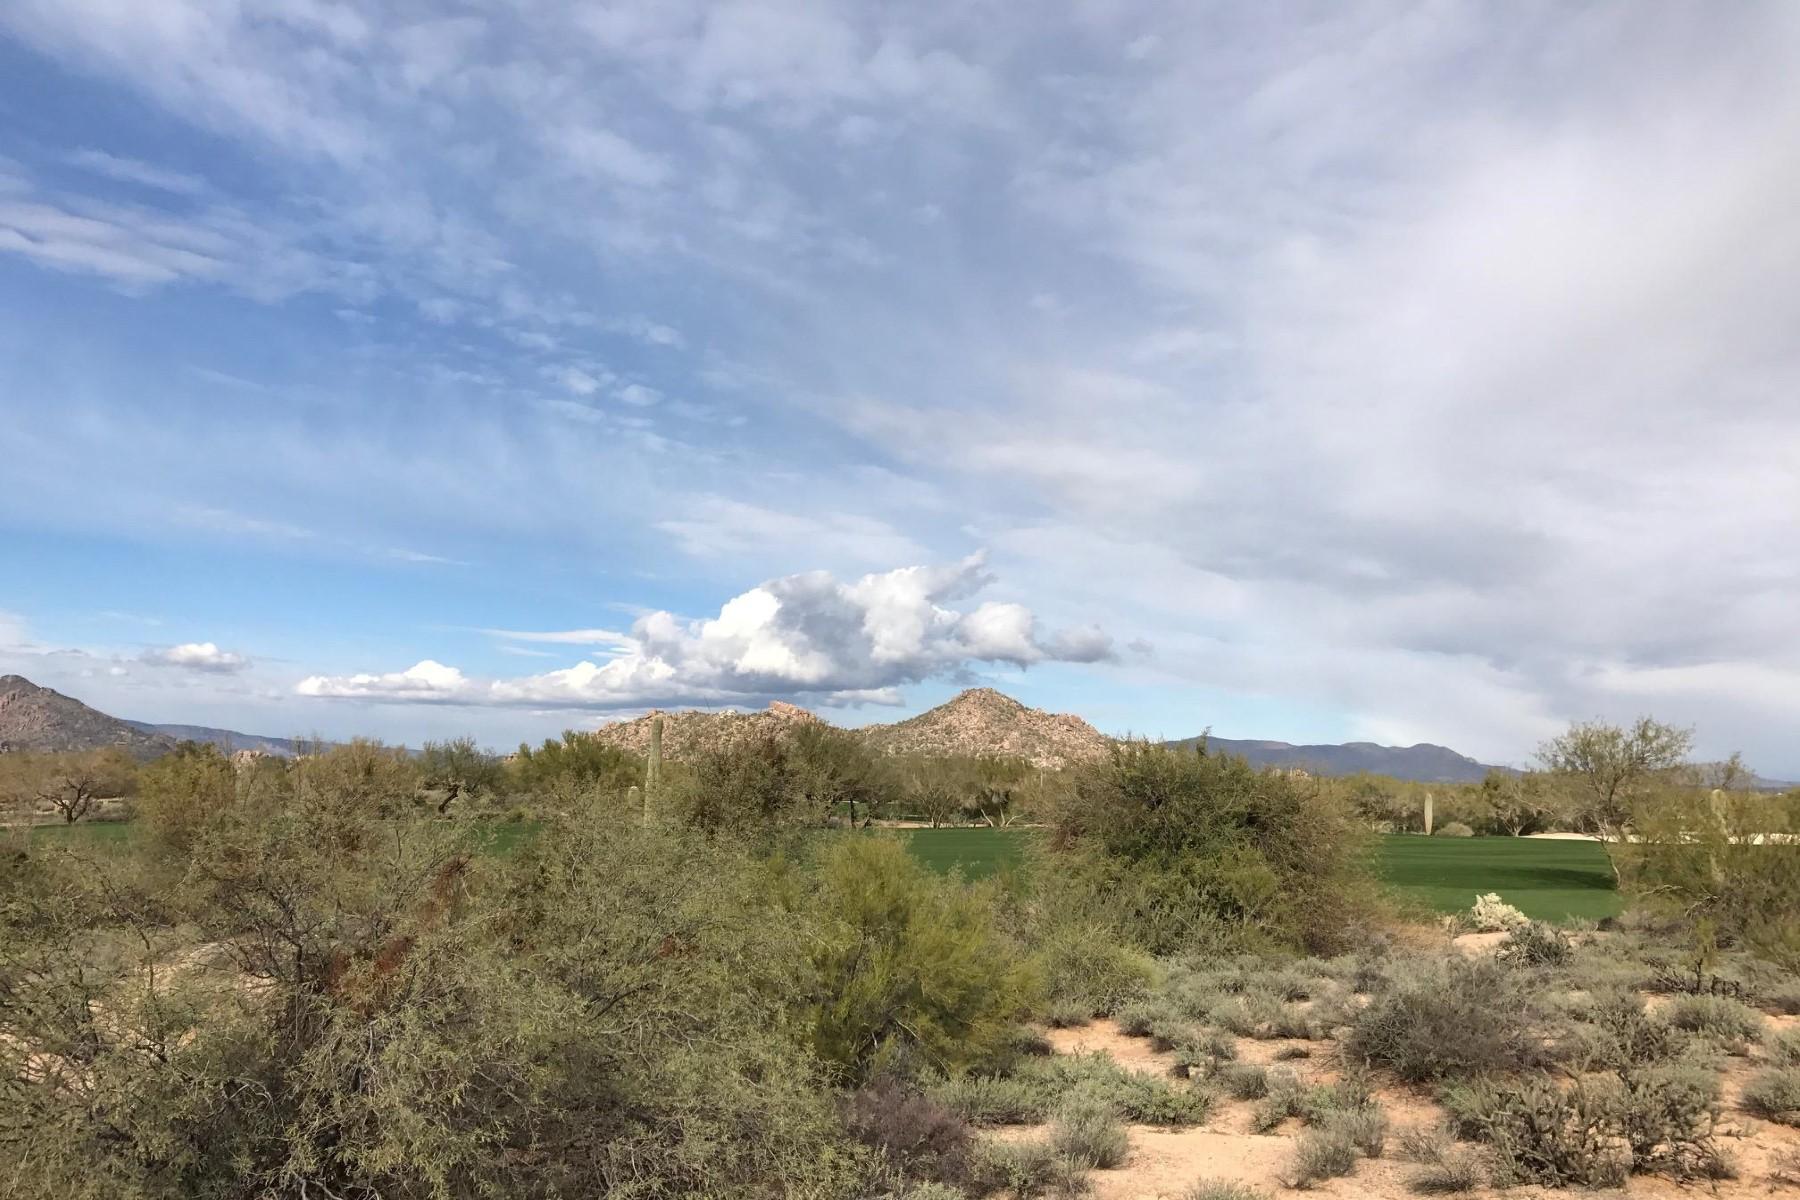 Terreno para Venda às Beautiful lot on the golf course in Whisper Rock 7618 E Whisper Rock Trl #50 Scottsdale, Arizona, 85266 Estados Unidos